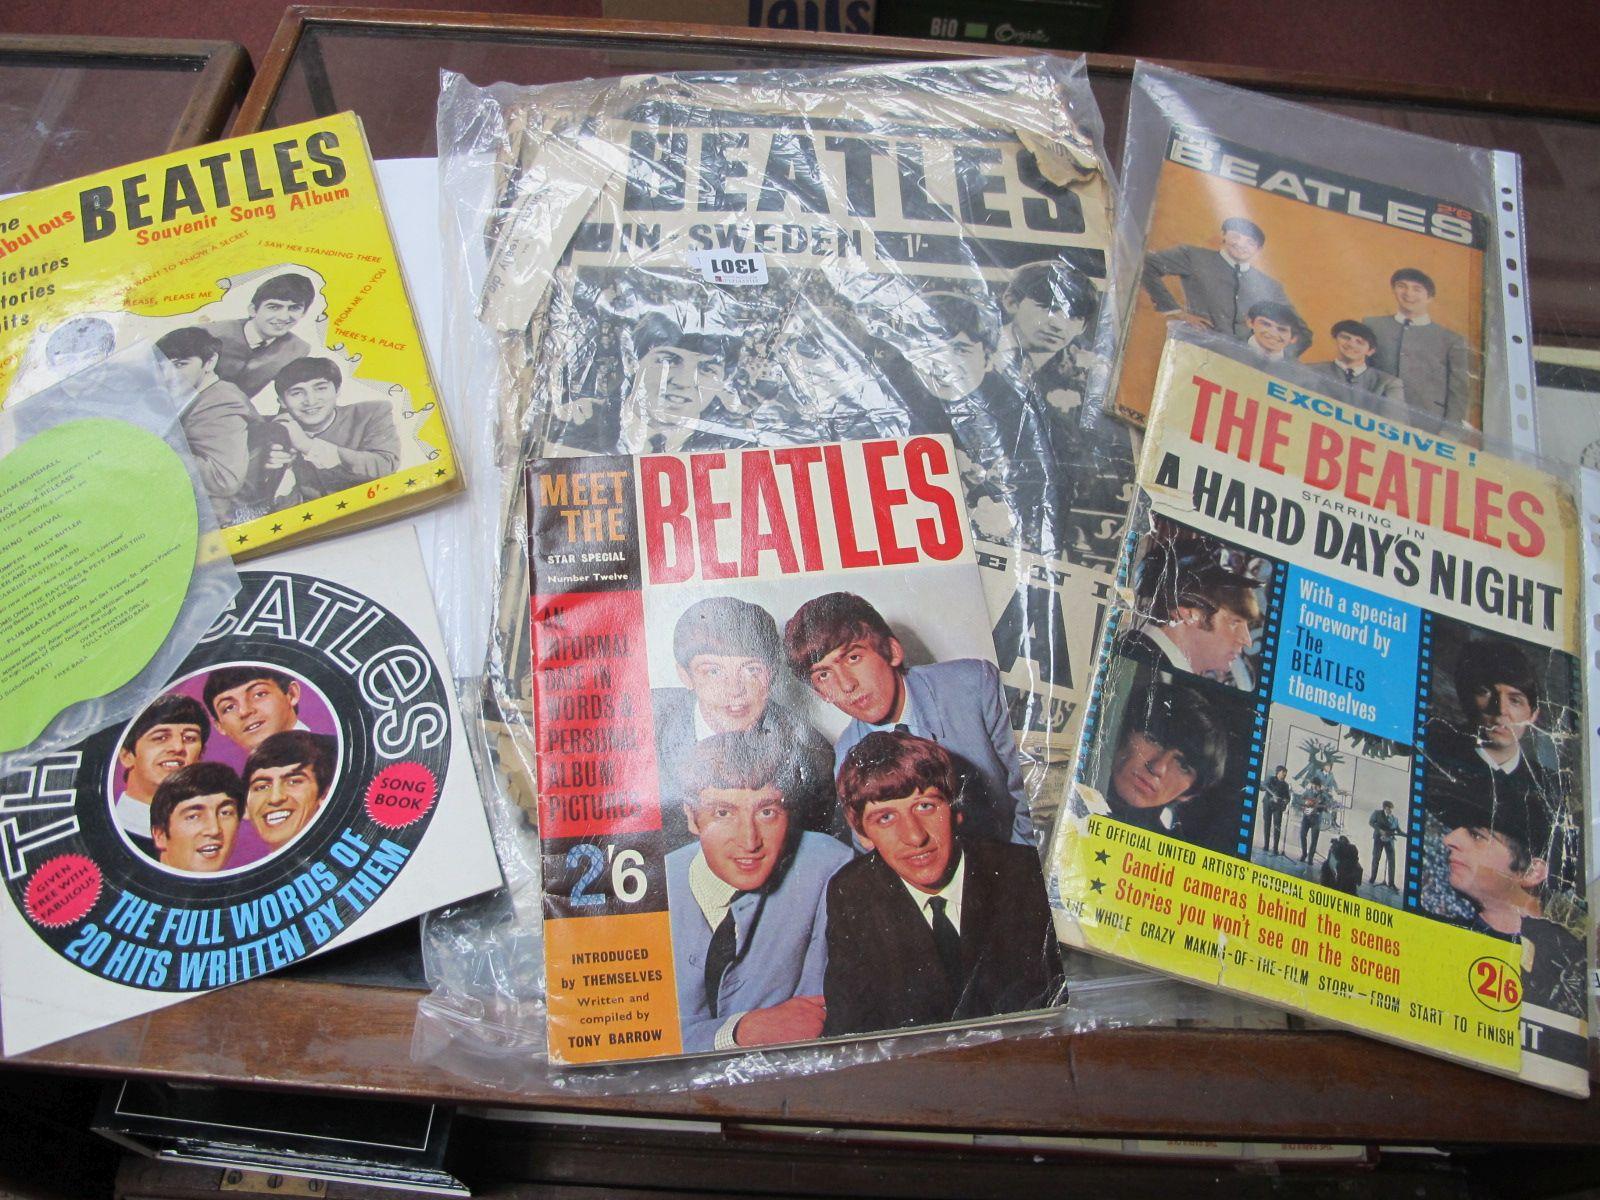 The Beatles - 1960's magazines, newspaper scraps, etc.